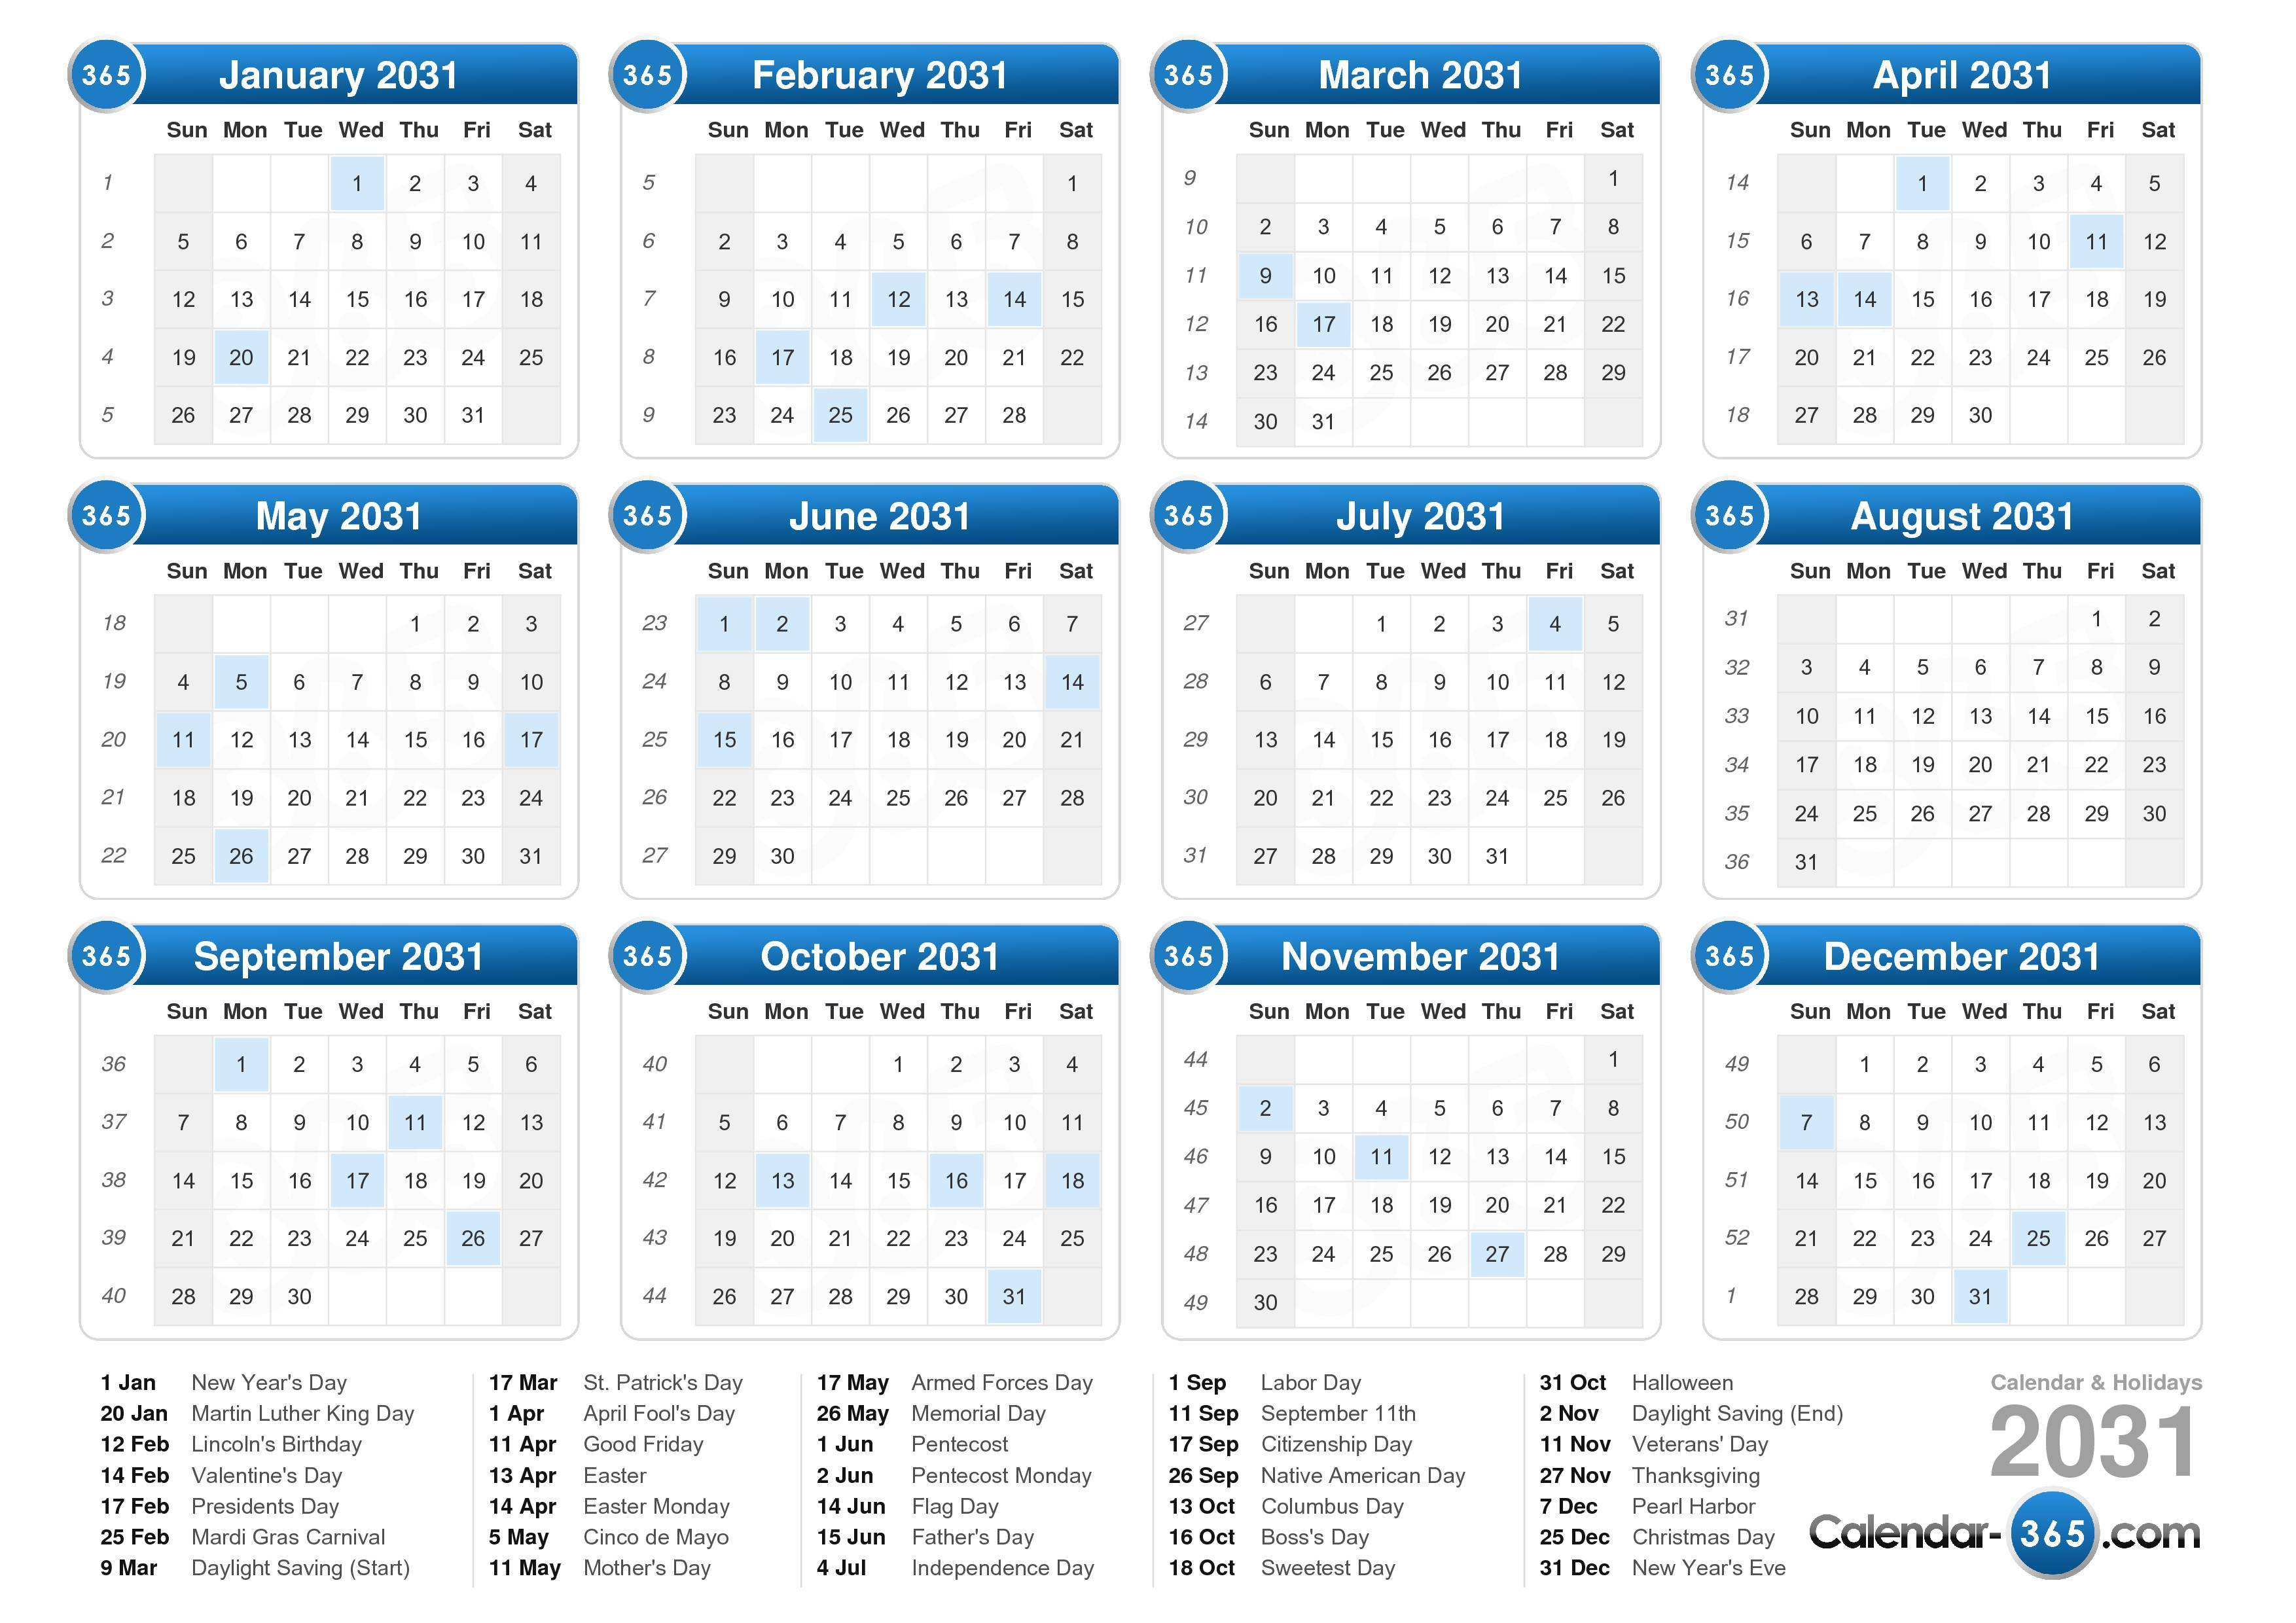 Calendar 2015 with Holidays.